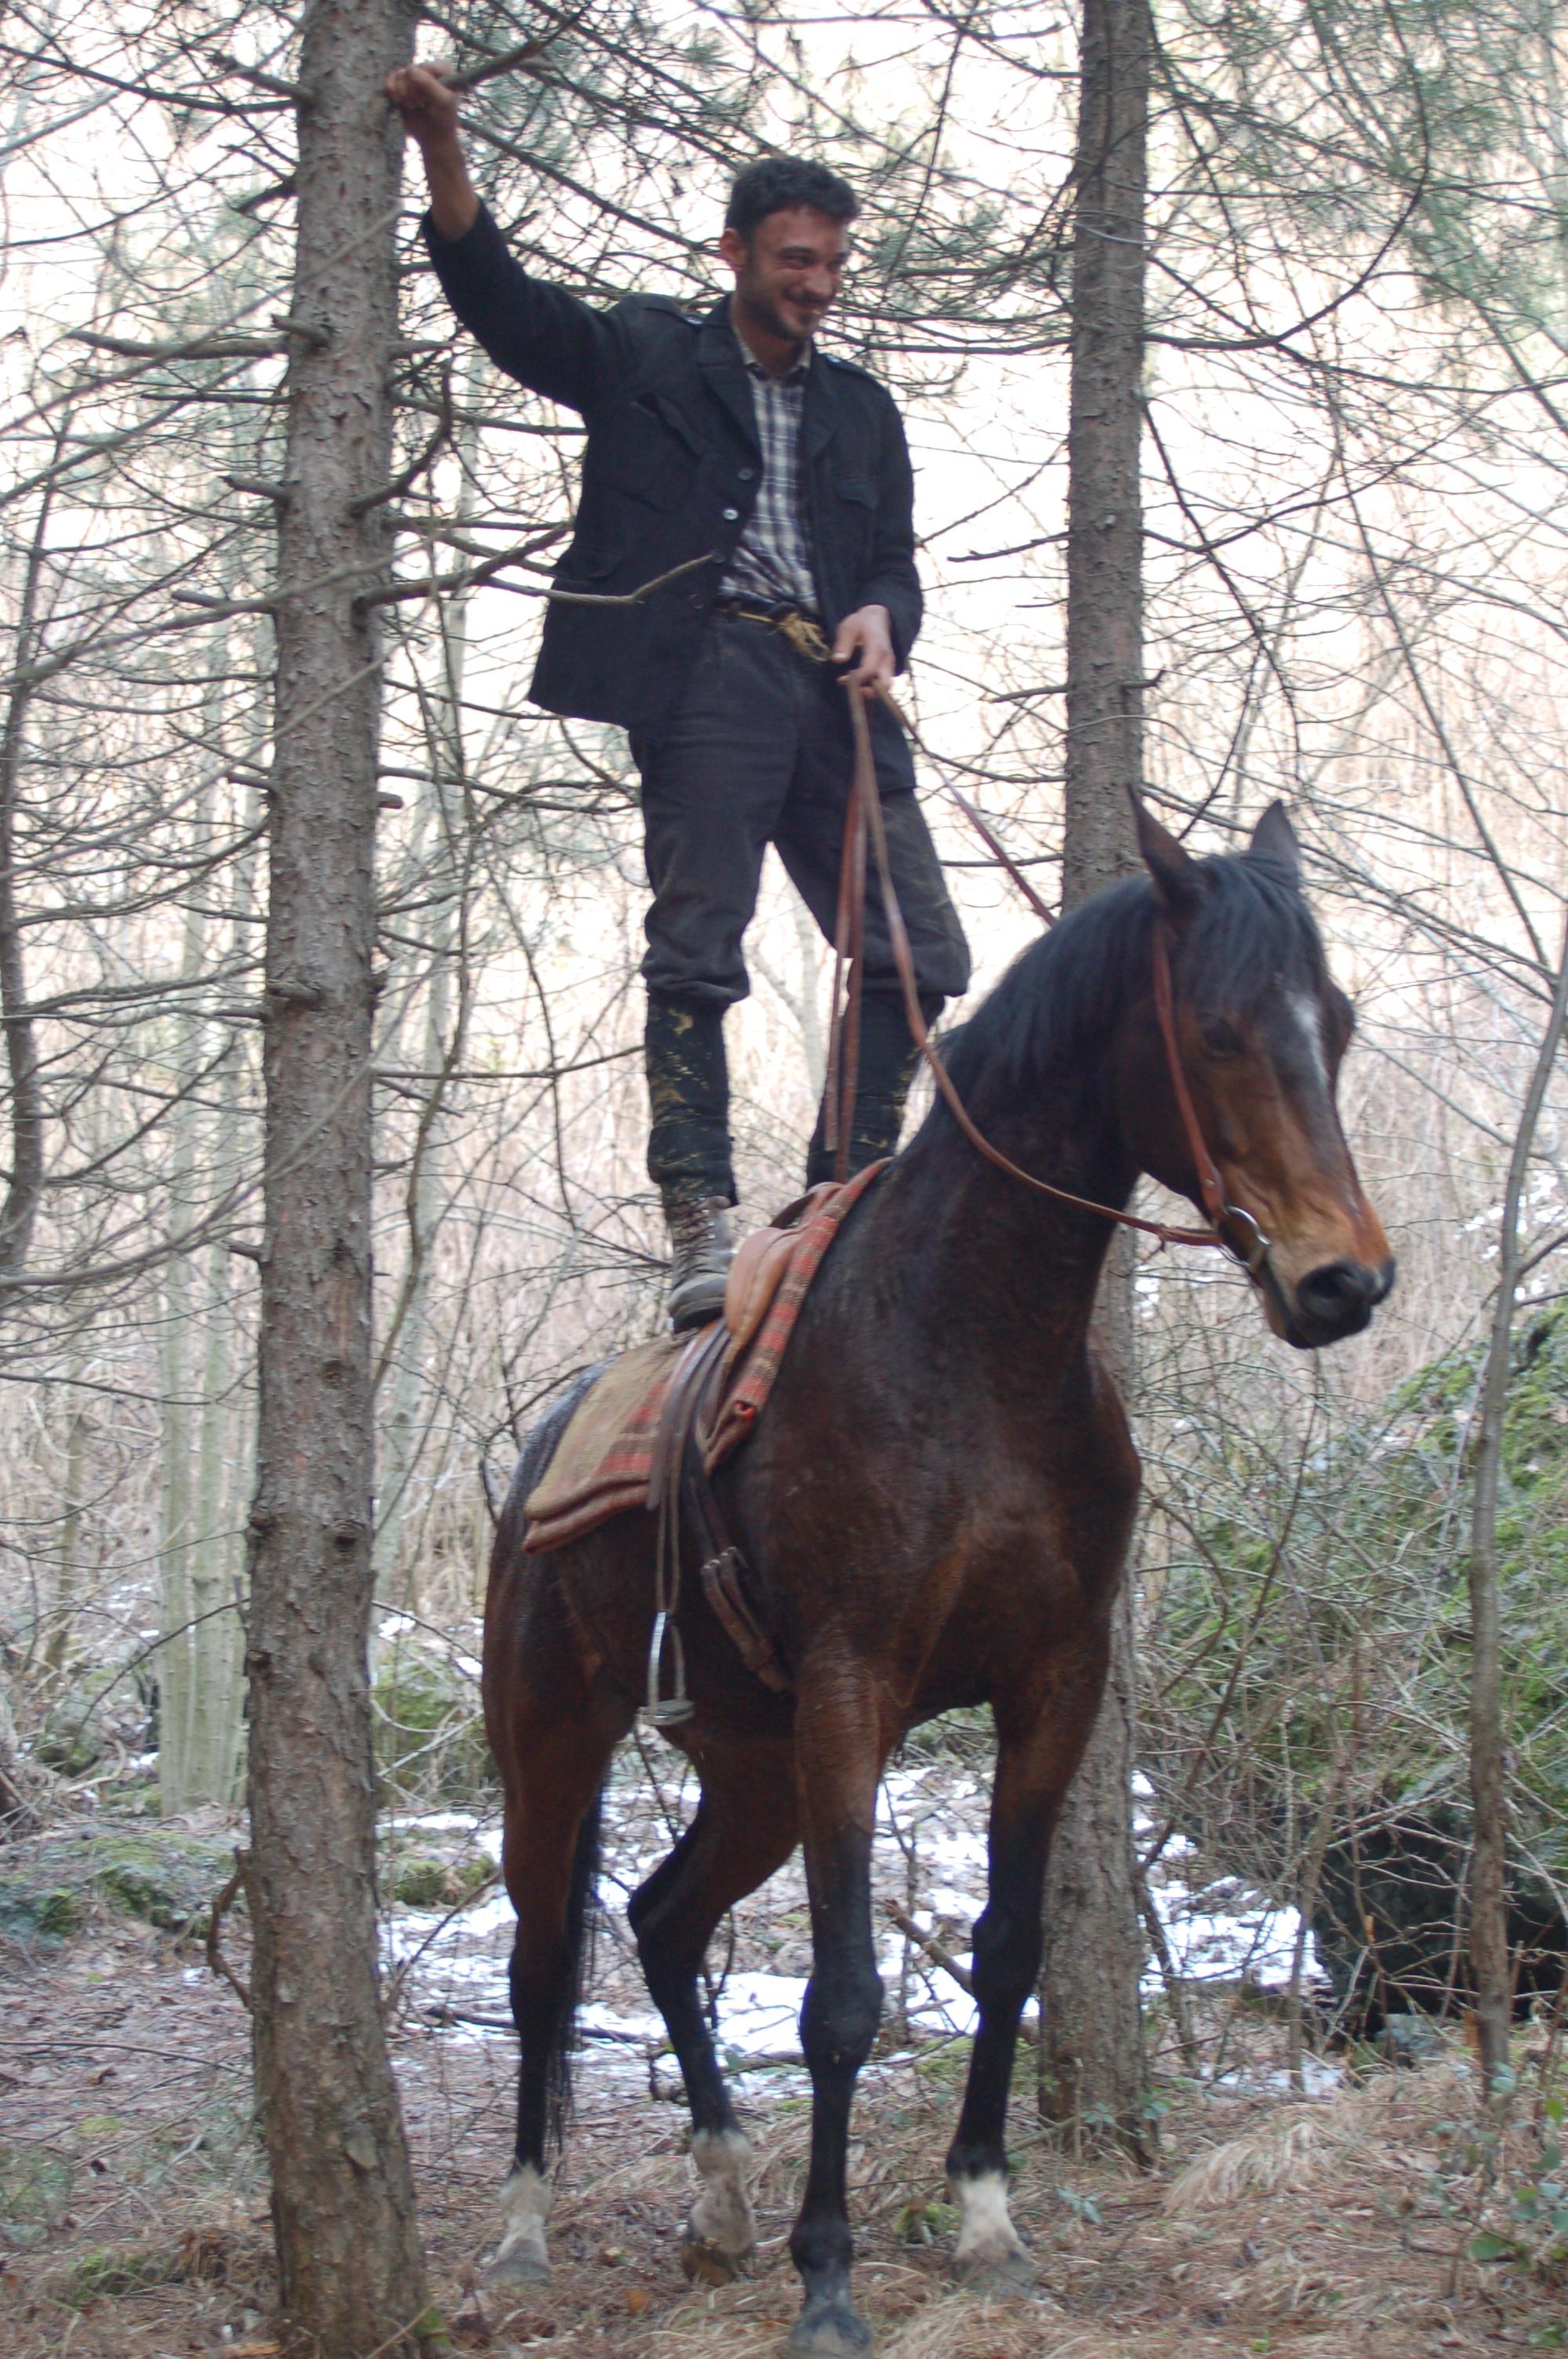 partigiano a cavallo.JPG